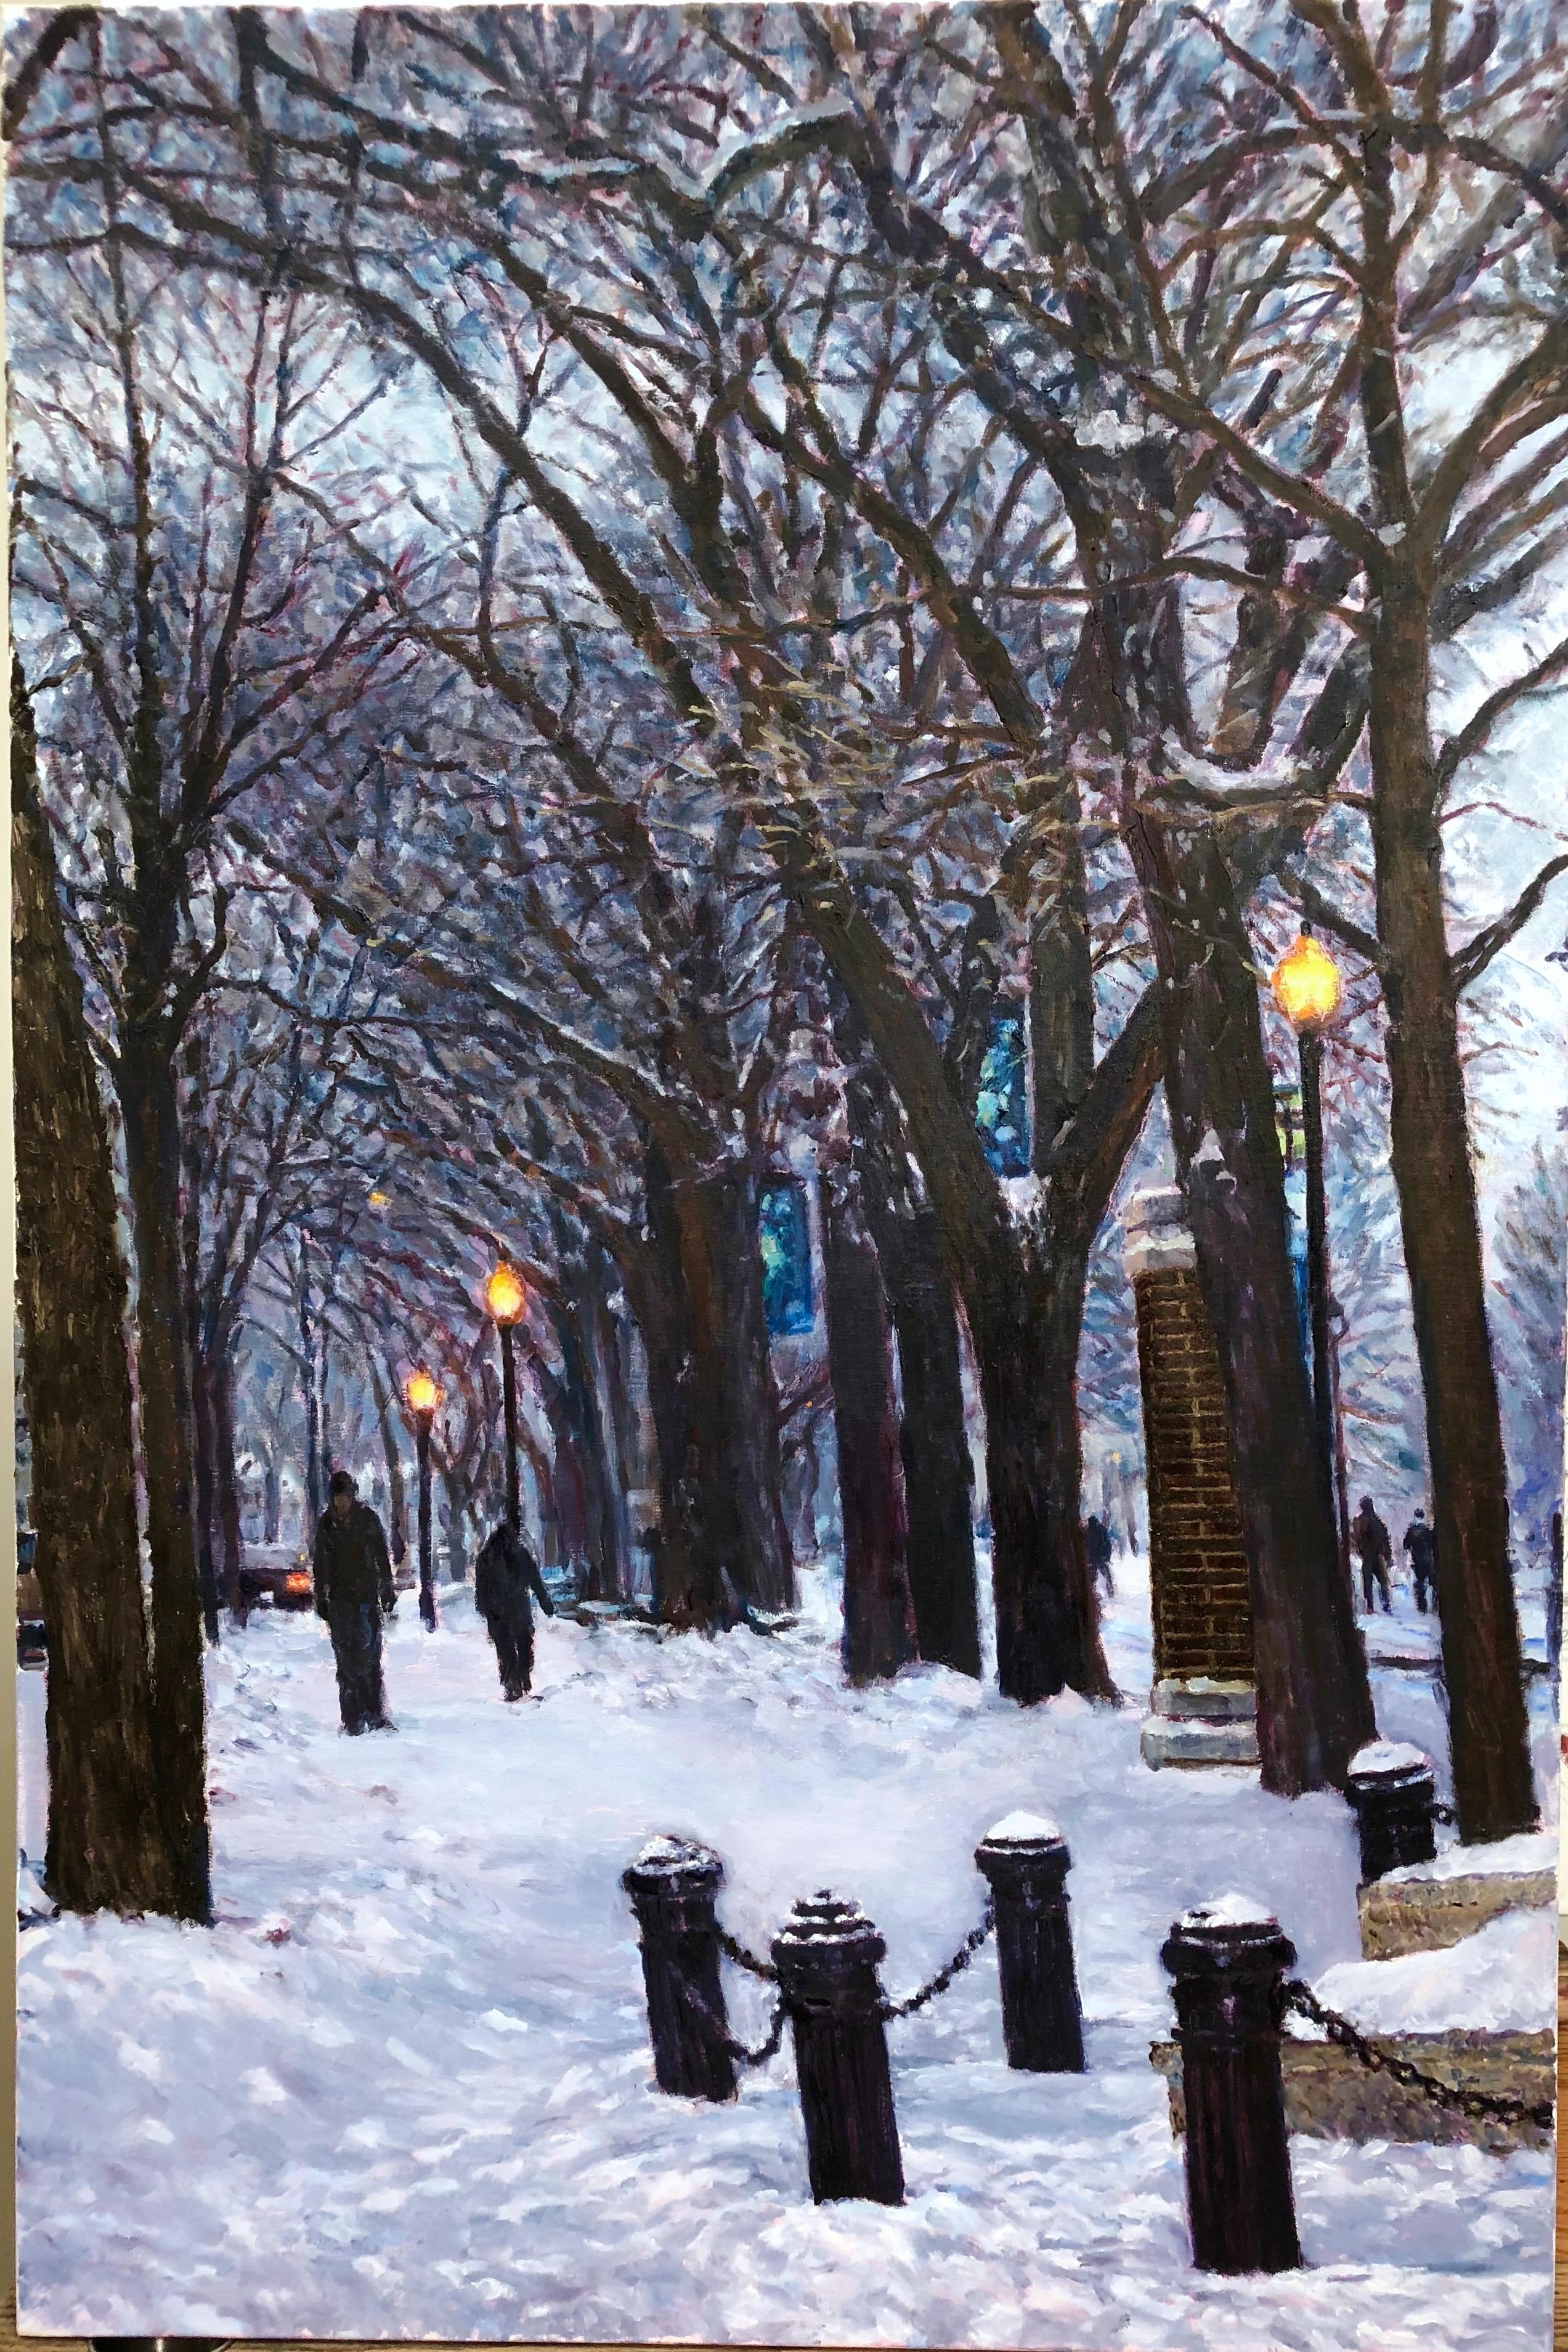 Snowy Evening Scene